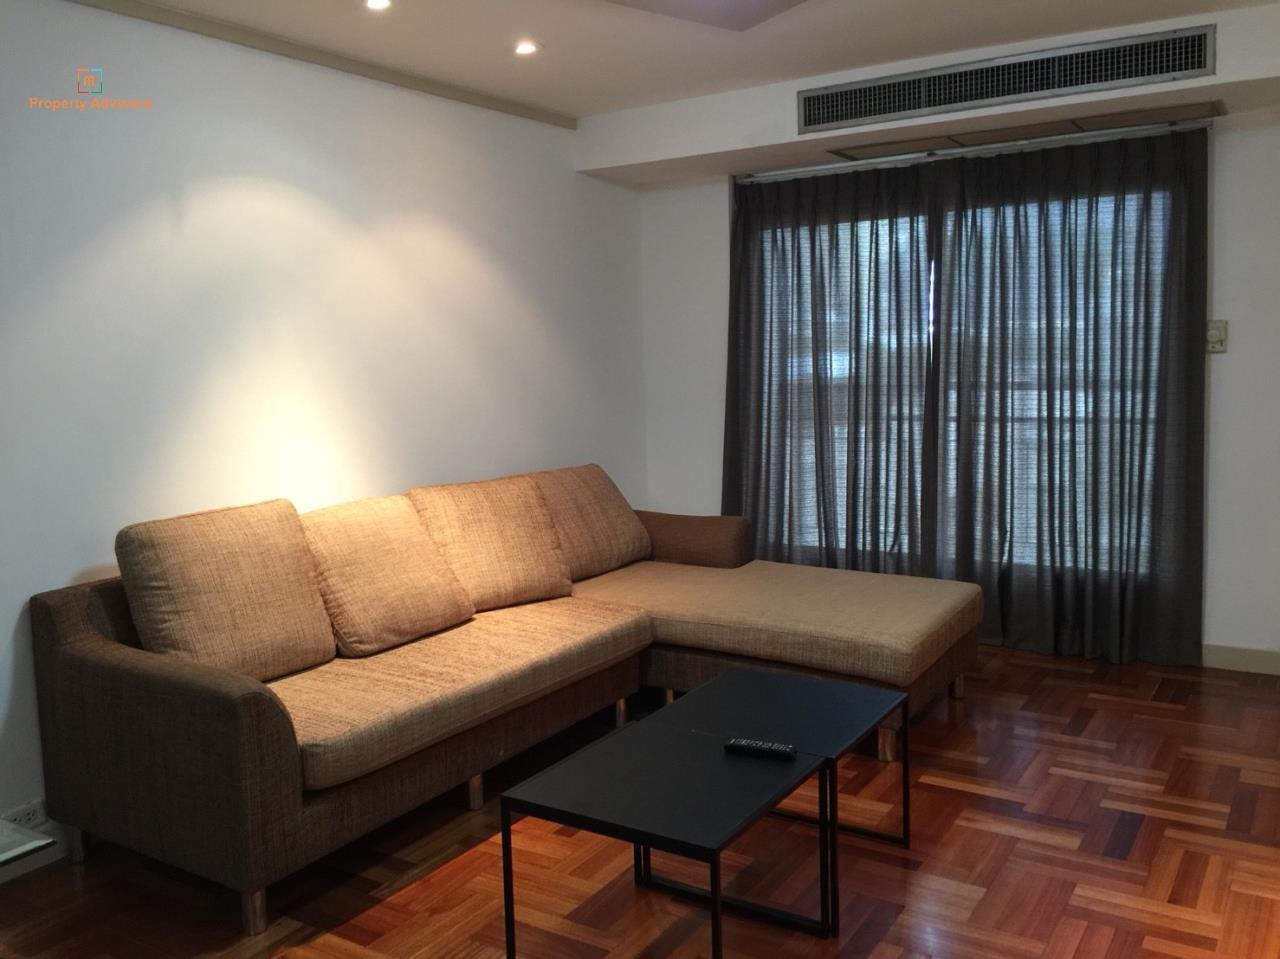 m2 Property Advisors Agency's Liberty ParkII Sukhumvit 11 1